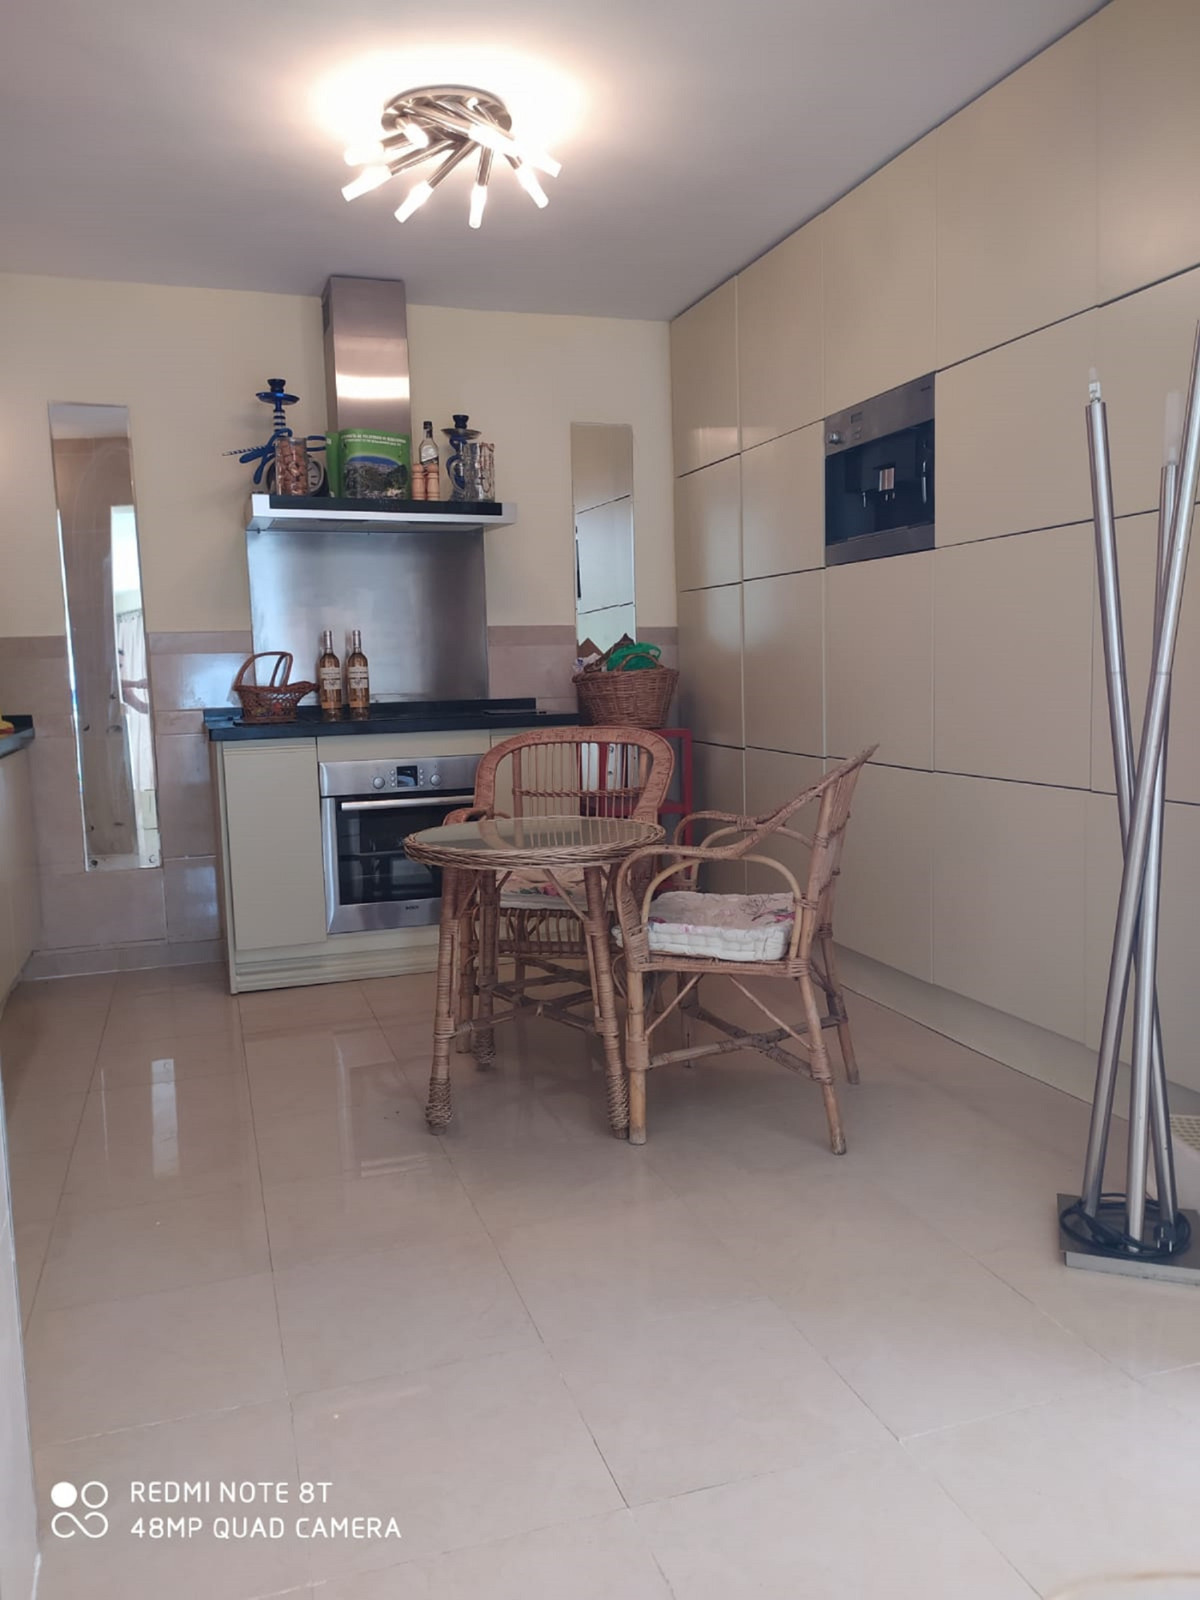 Sales - House - Benalmadena - 36 - mibgroup.es